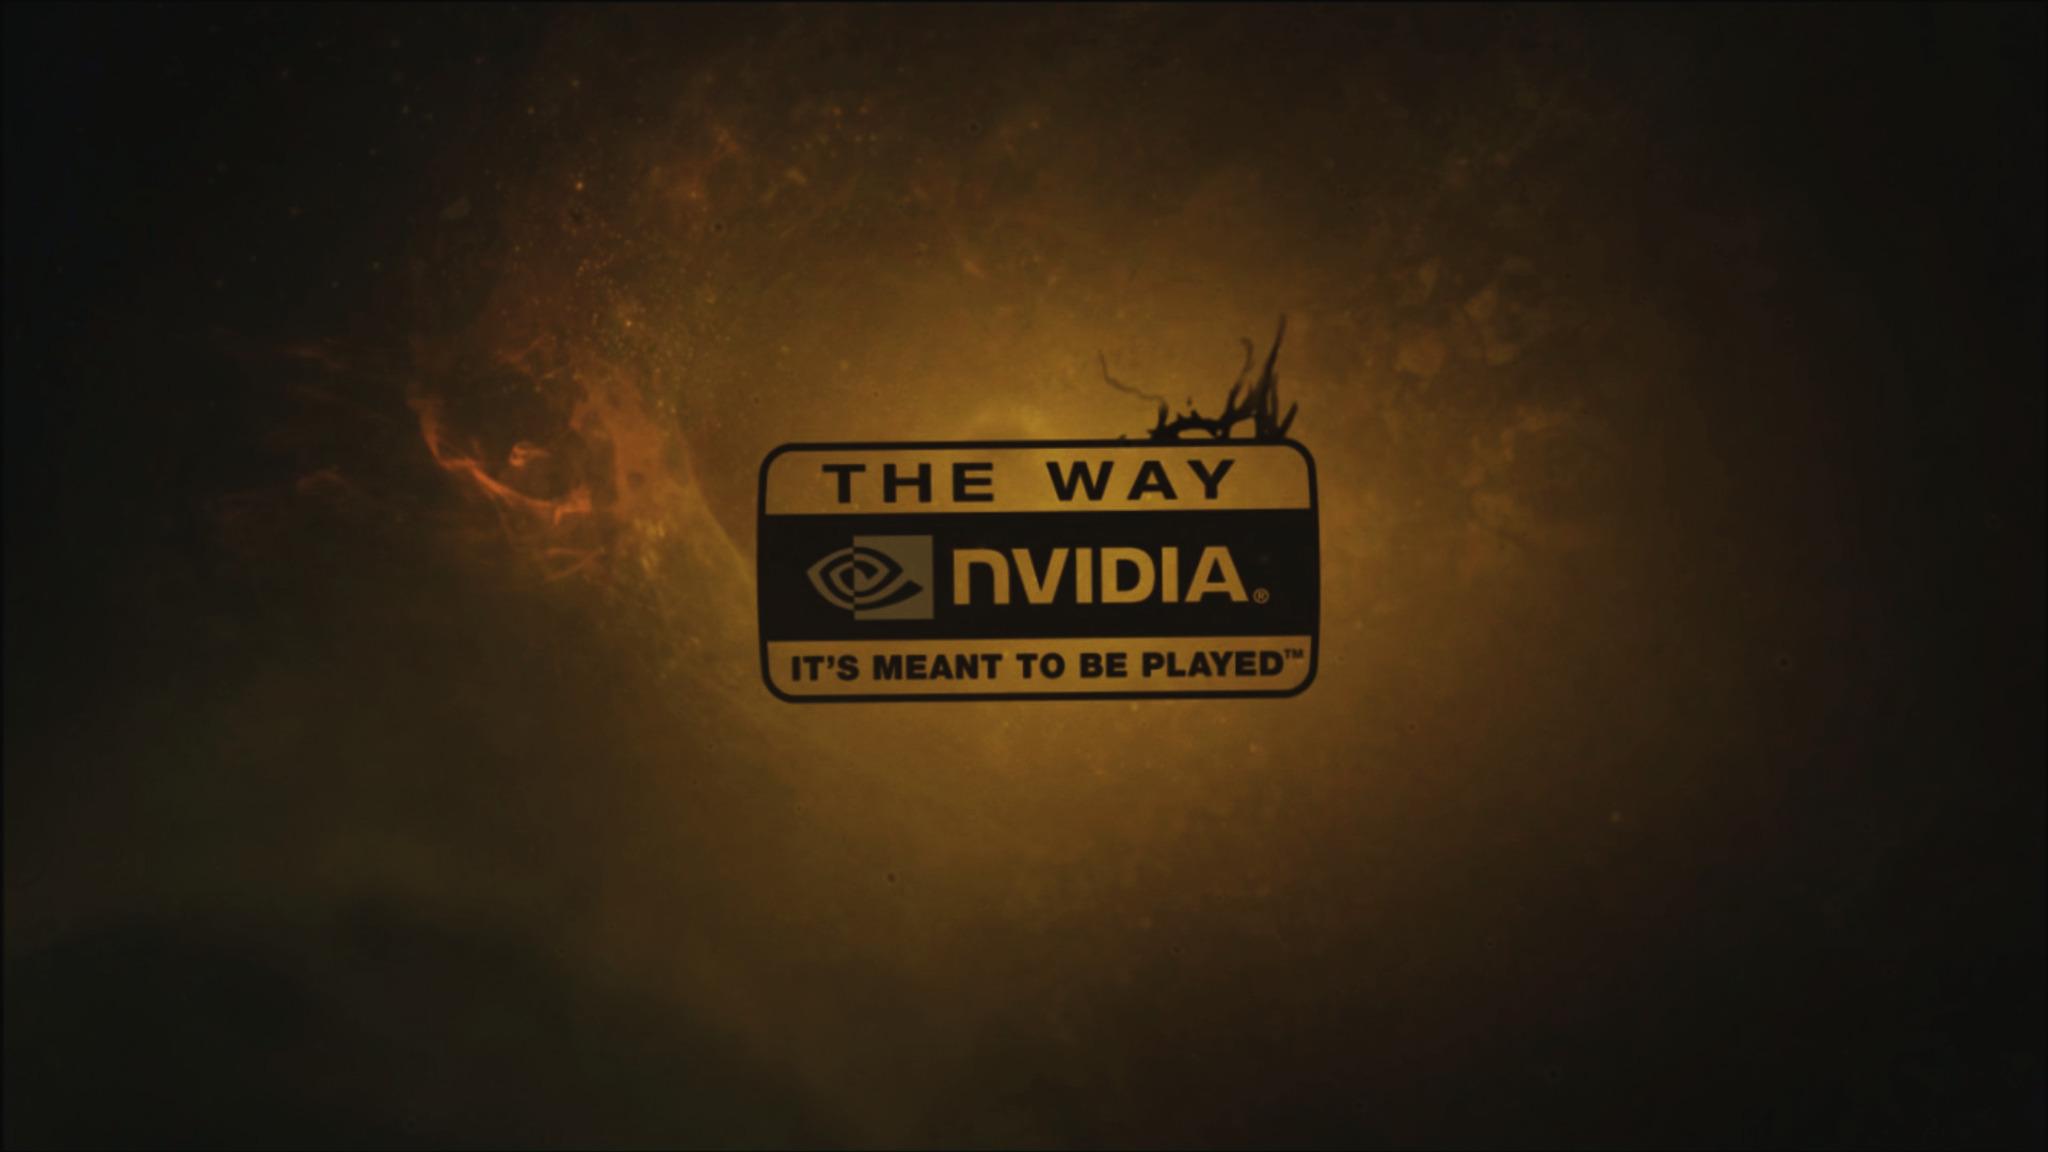 2048x1152 Nvidia Gaming 2048x1152 Resolution Hd 4k